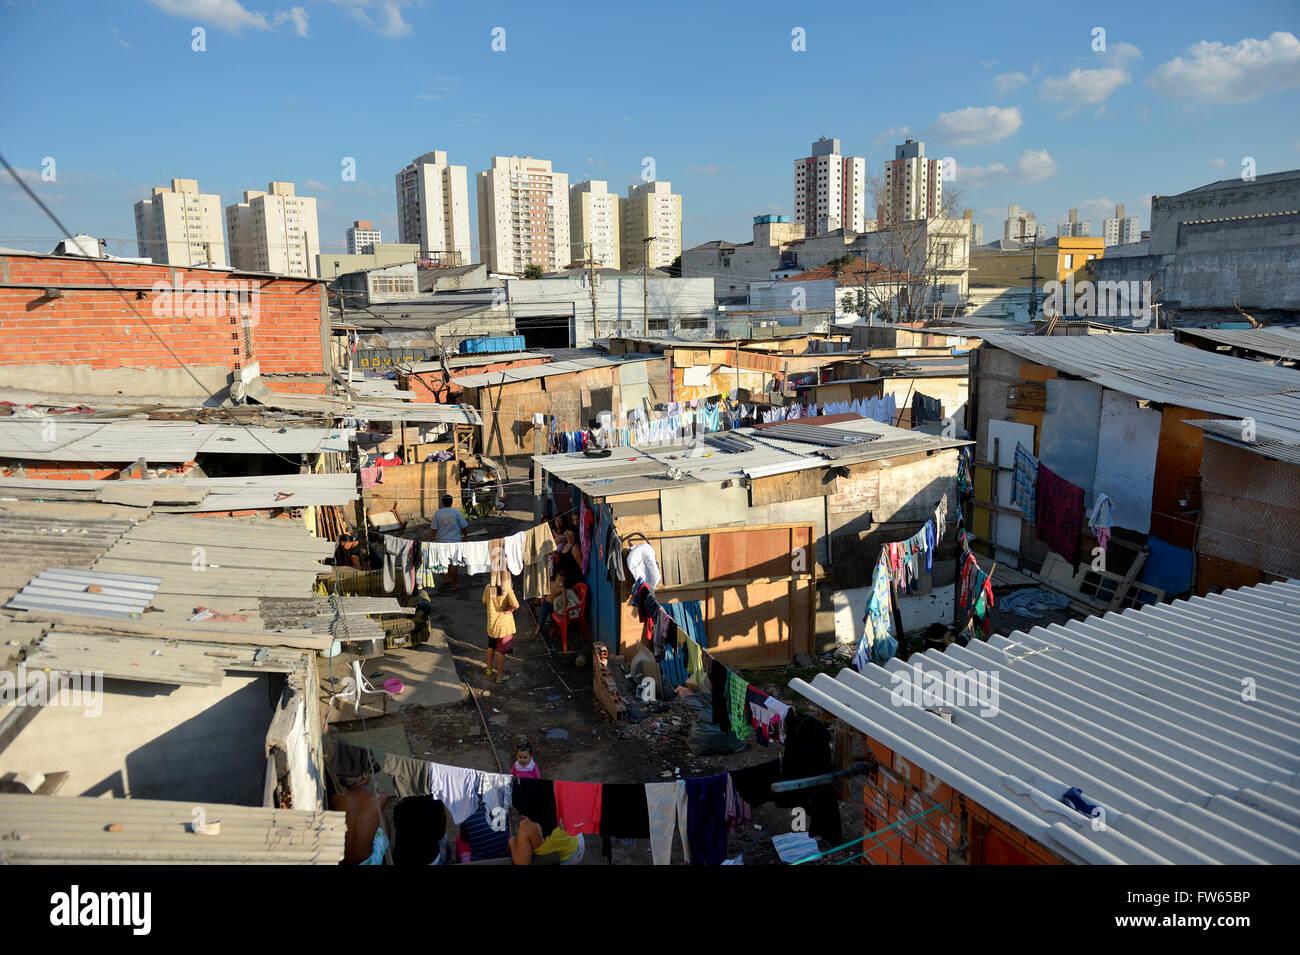 Slums of wood huts on occupied land, Favela 21 de Abril, São Paulo, Brazil - Stock Image